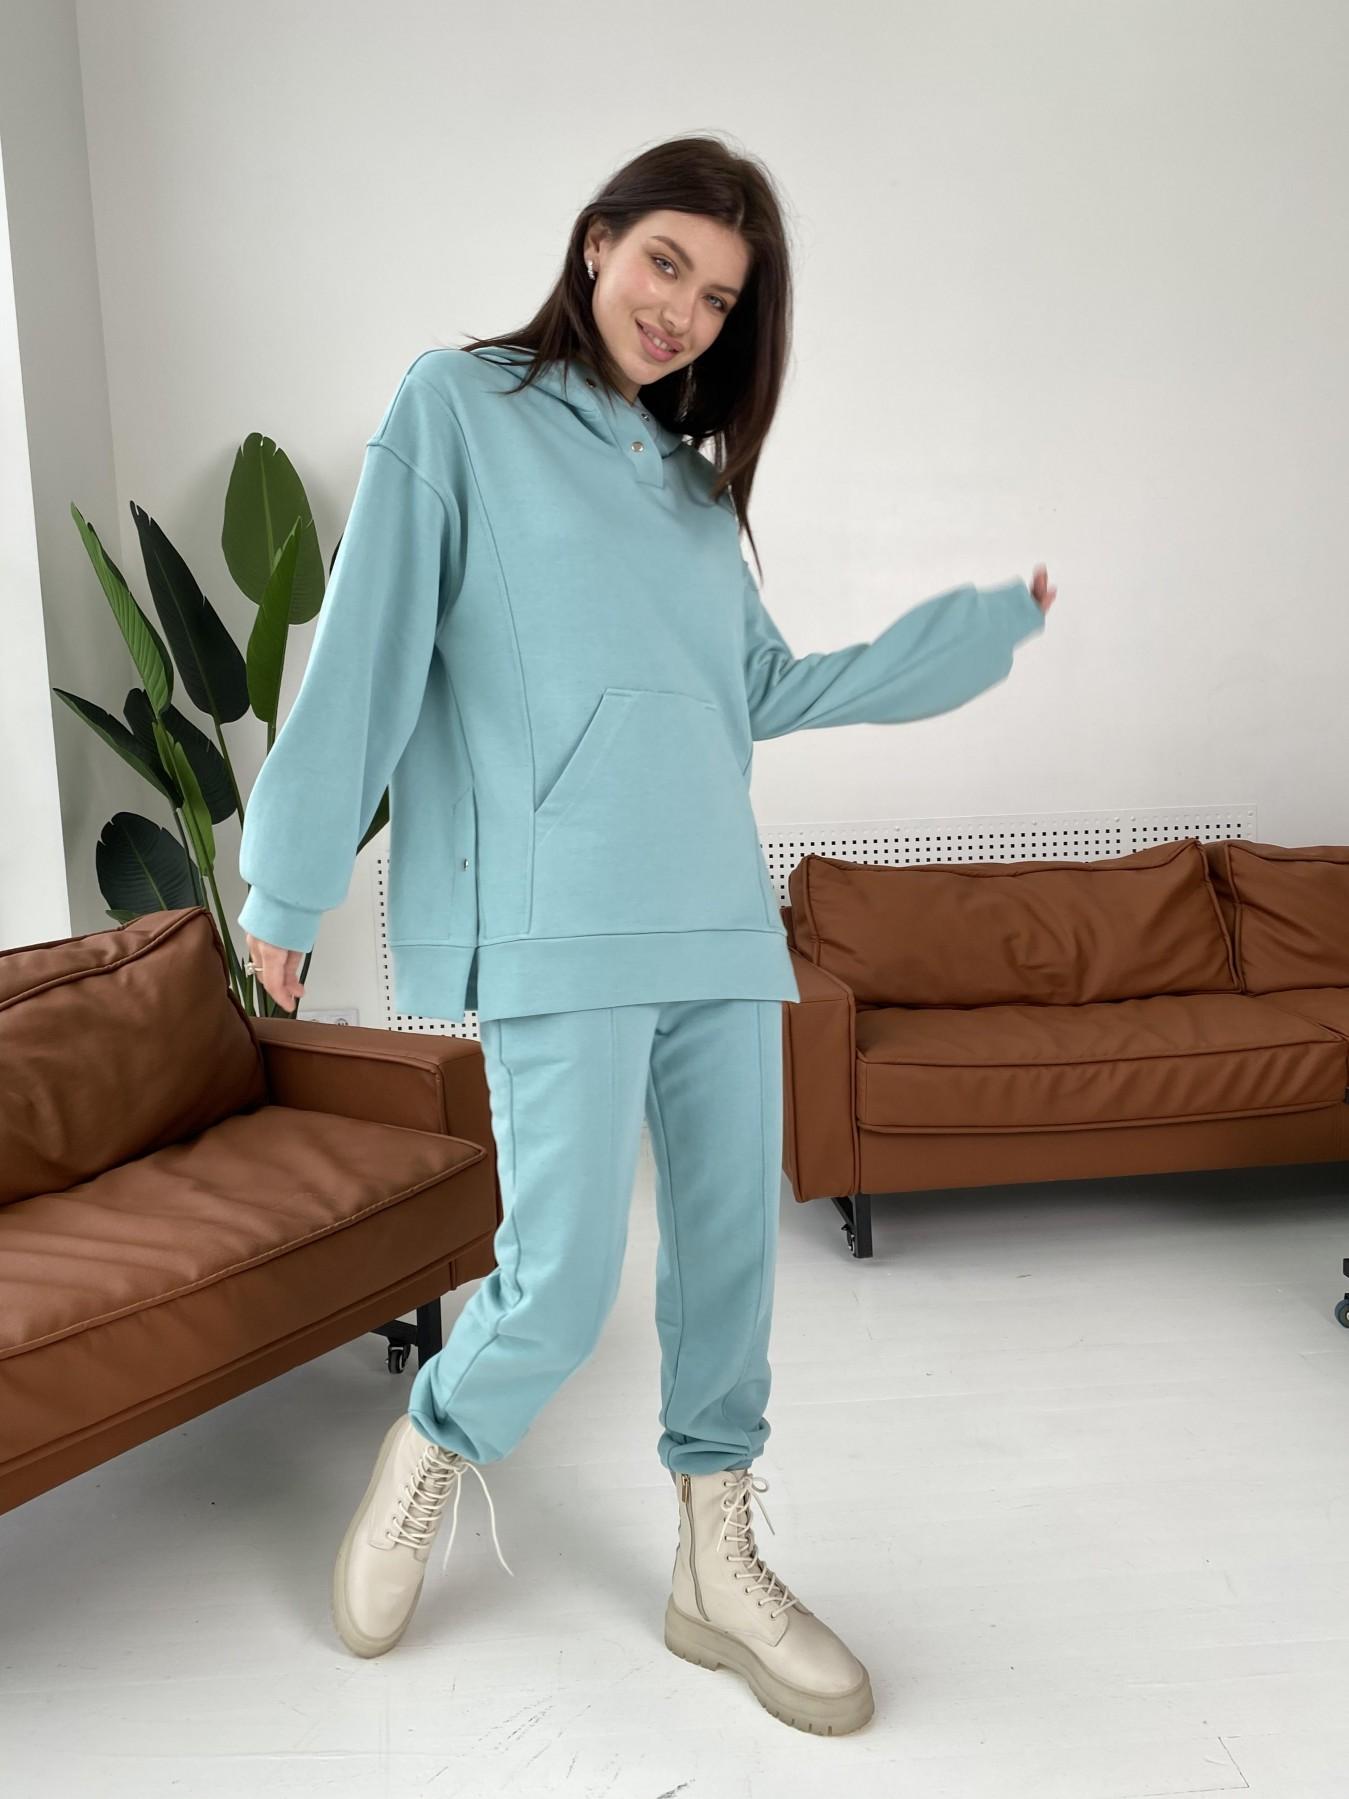 Лайф костюм  из 3х нитки 10782 АРТ. 47205 Цвет: Олива - фото 1, интернет магазин tm-modus.ru